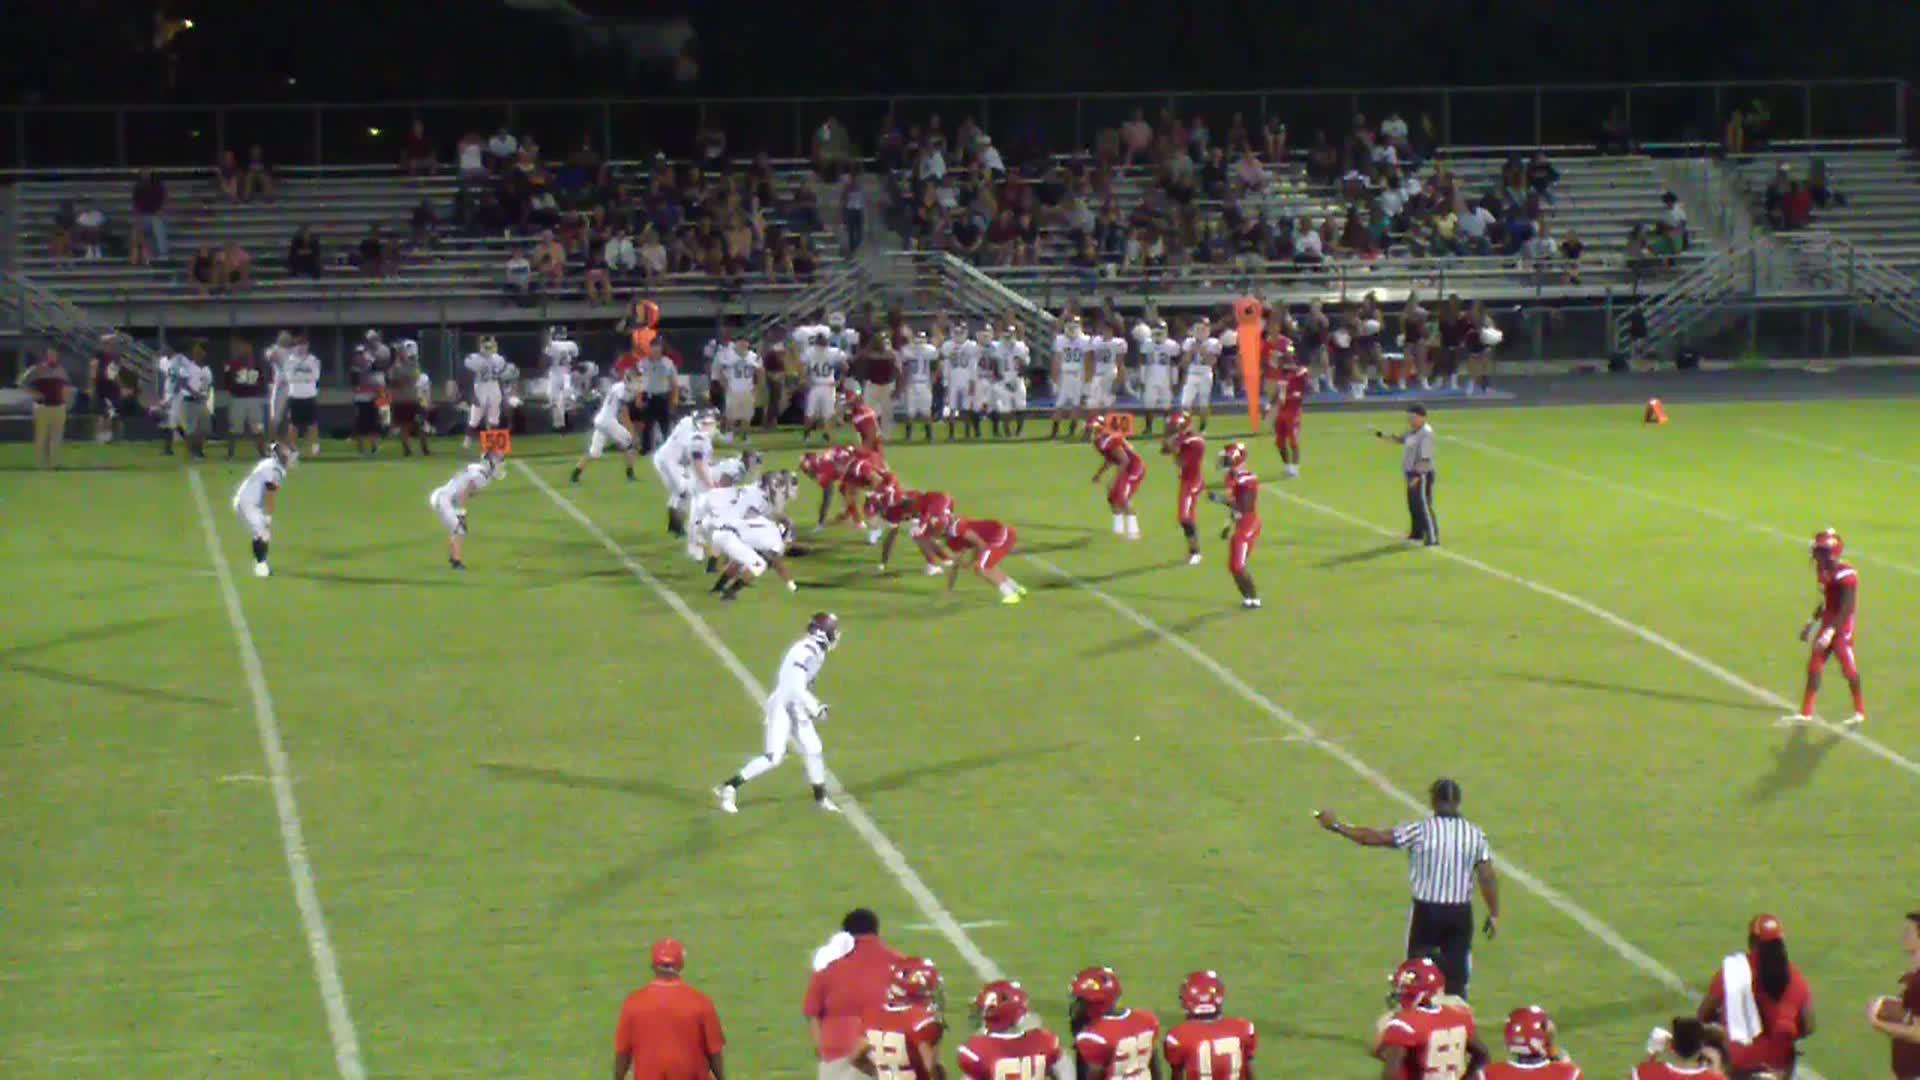 Wiregrass Ranch High School - Cristian Ramos highlights - Hudl